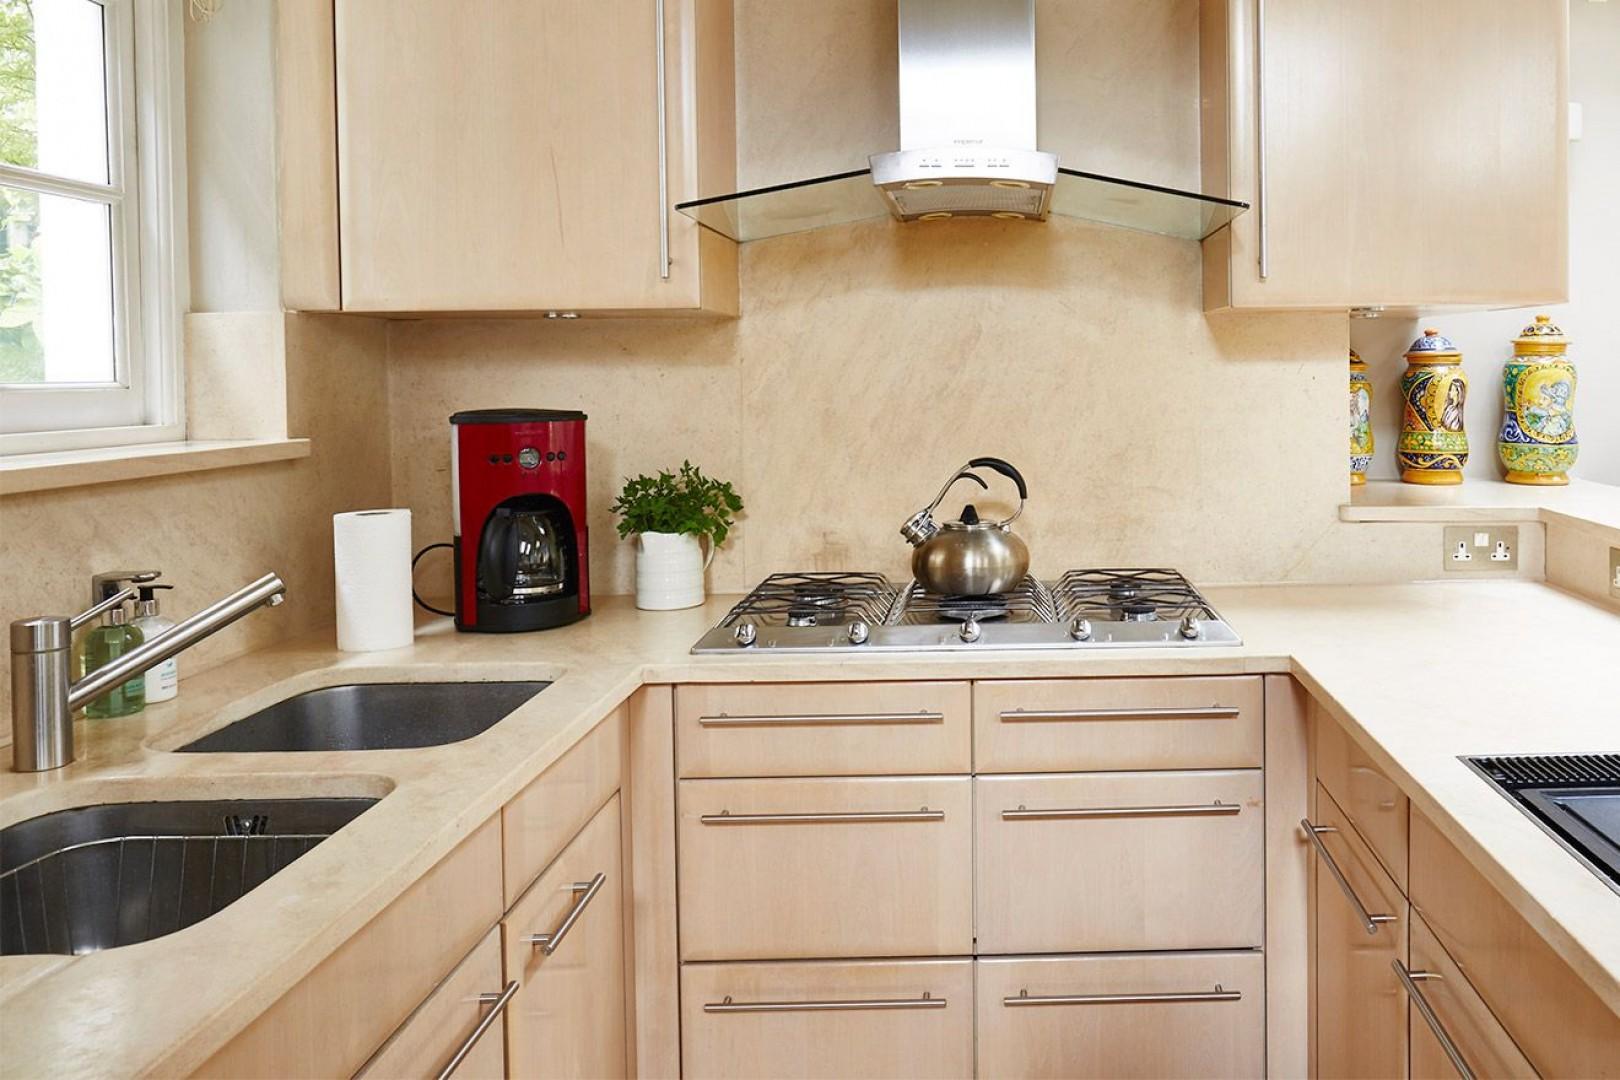 Fantastic kitchen for entertaining